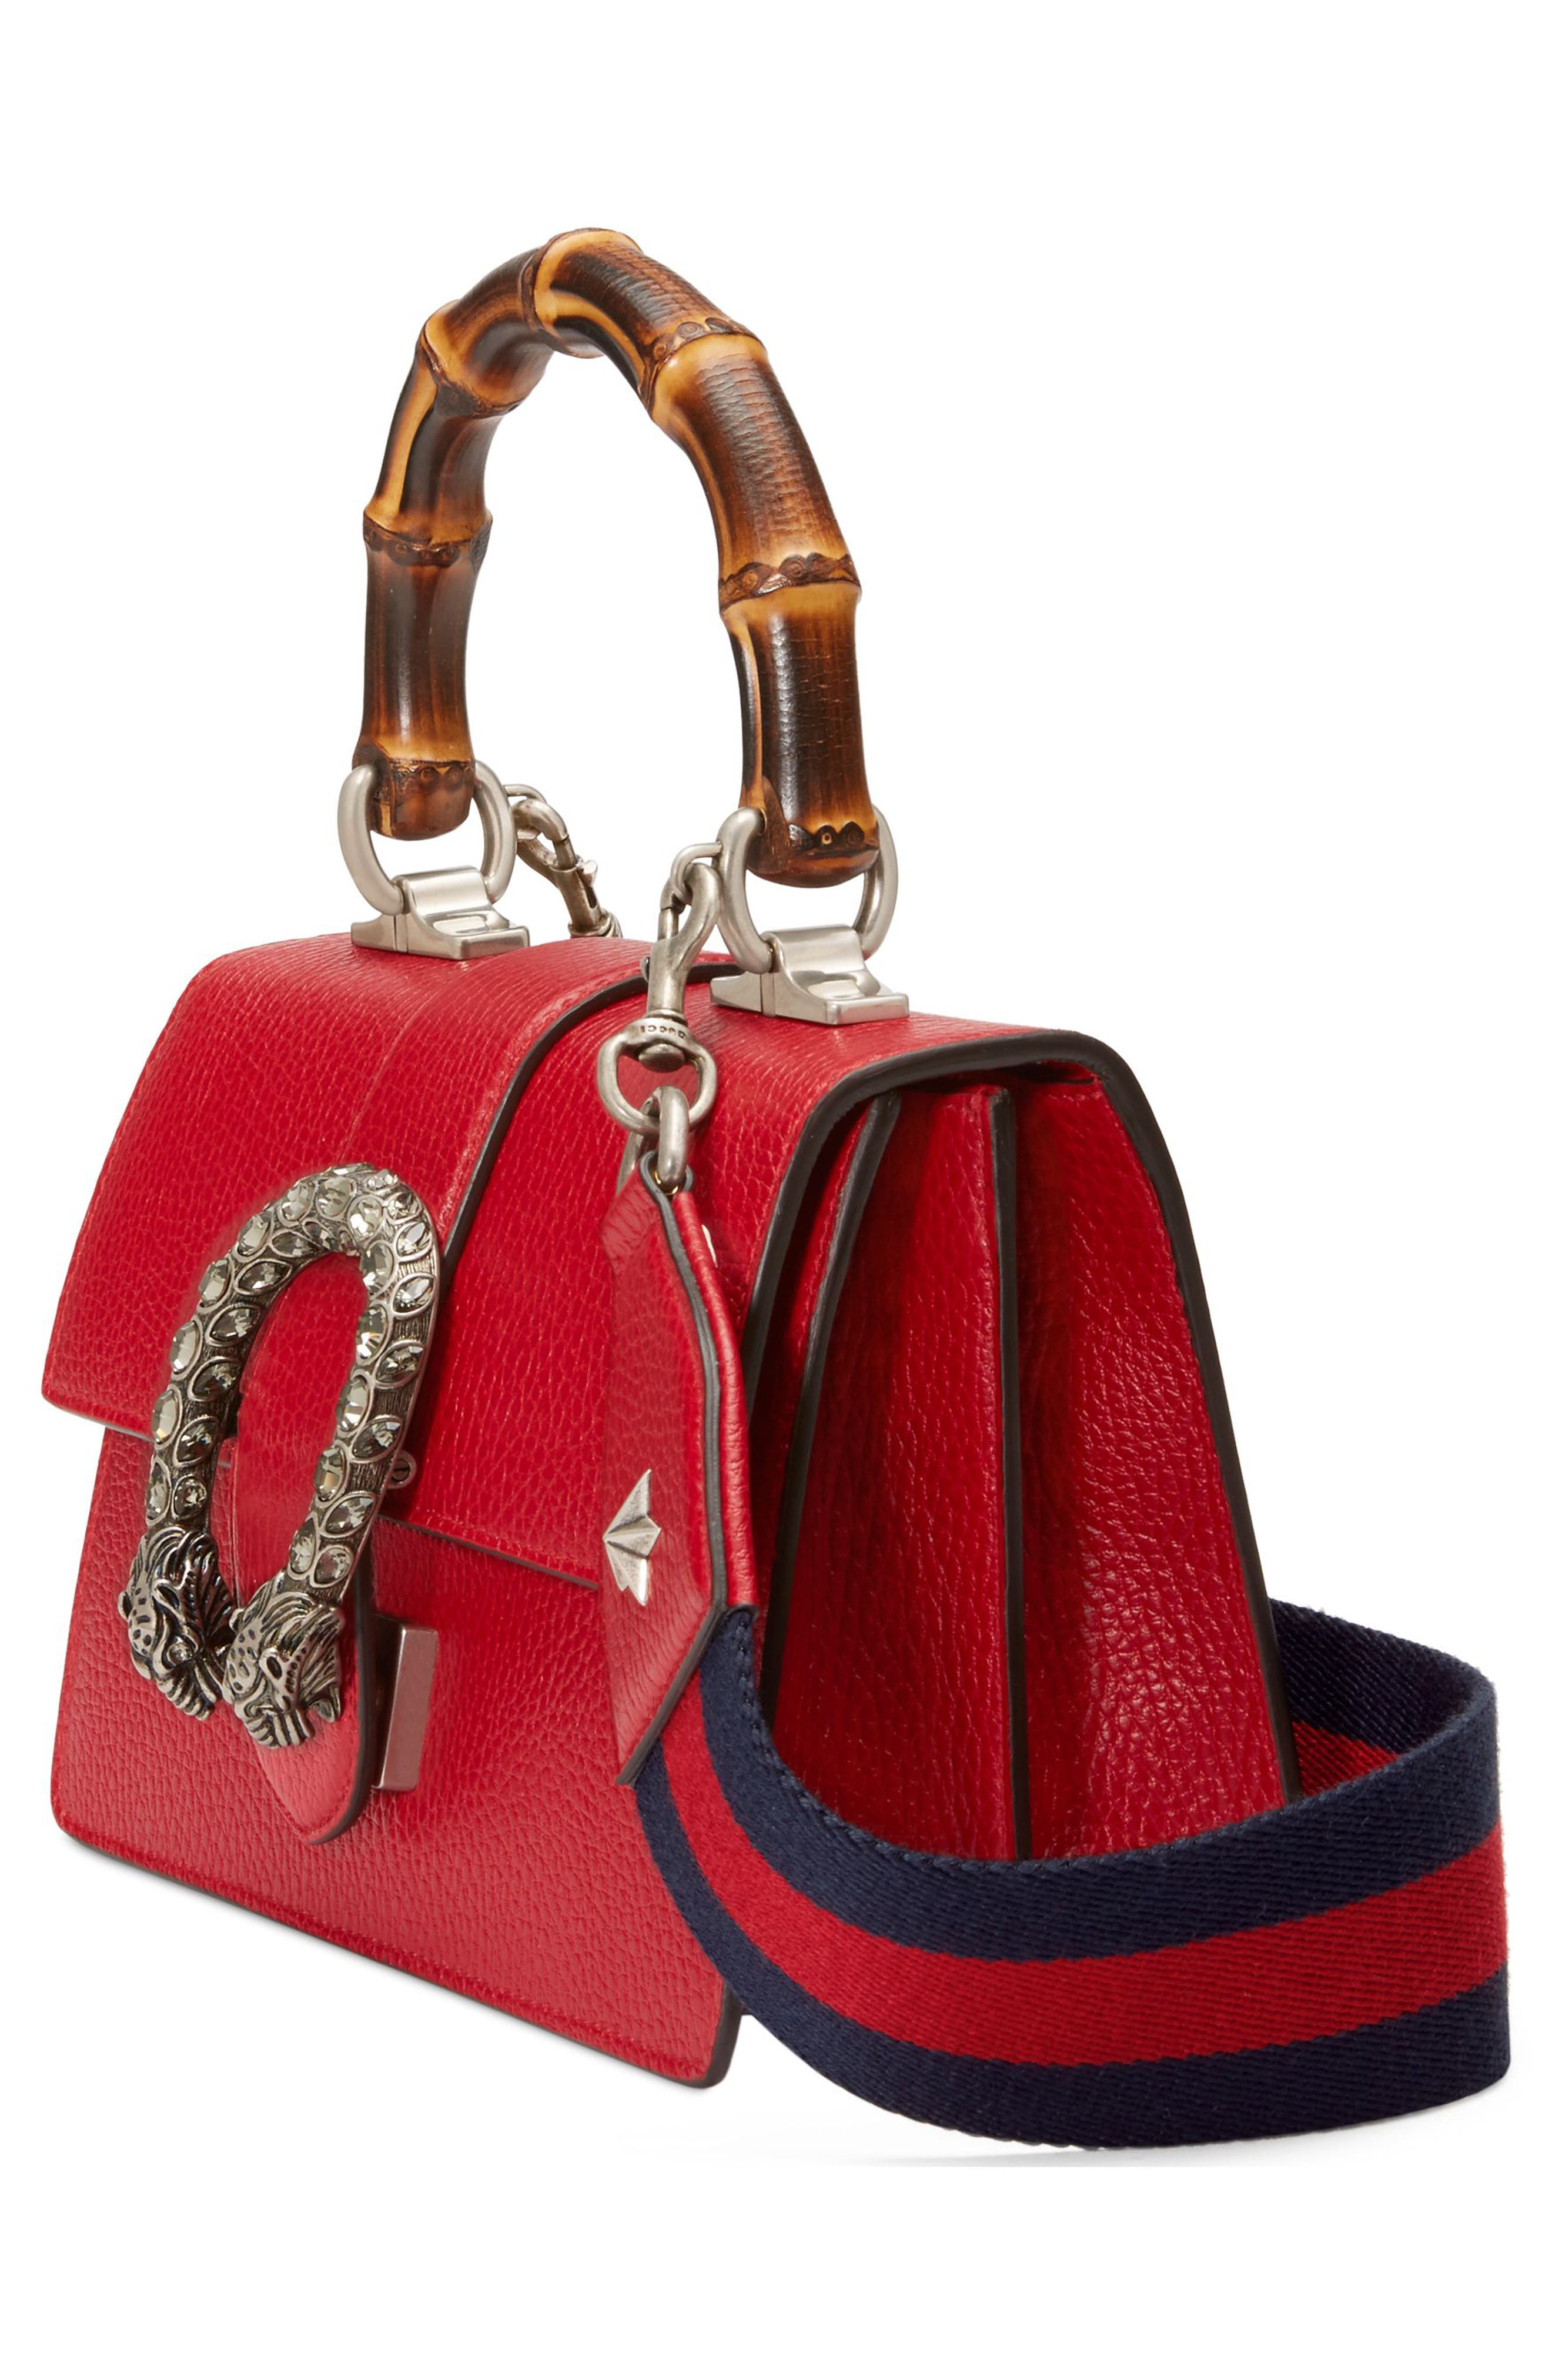 Mini Dionysus Leather Top Handle Satchel,                             Alternate thumbnail 4, color,                             Red/ Blue/ Black Diamond